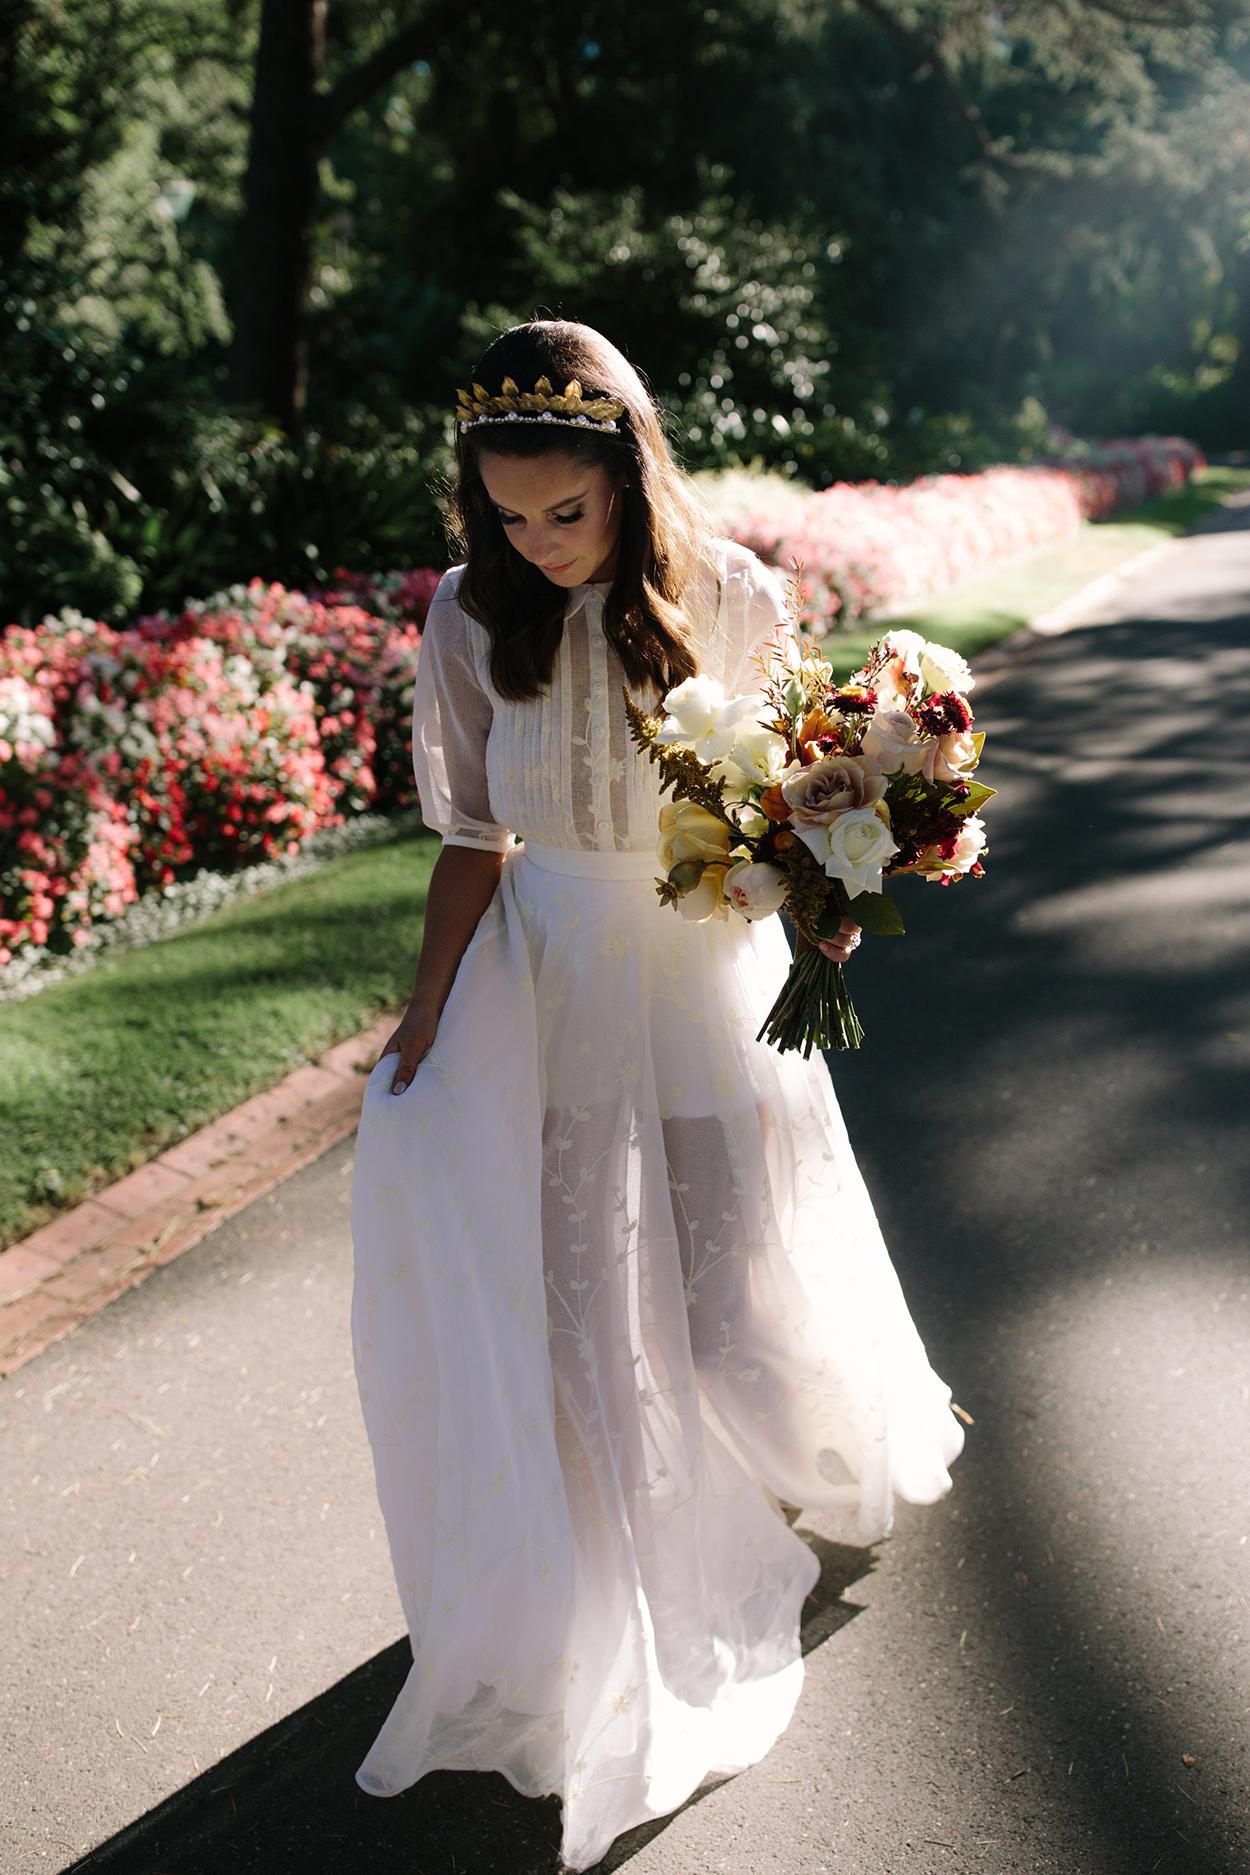 I-Got-You-Babe-Weddings-Hattie-Tyson0289.jpg